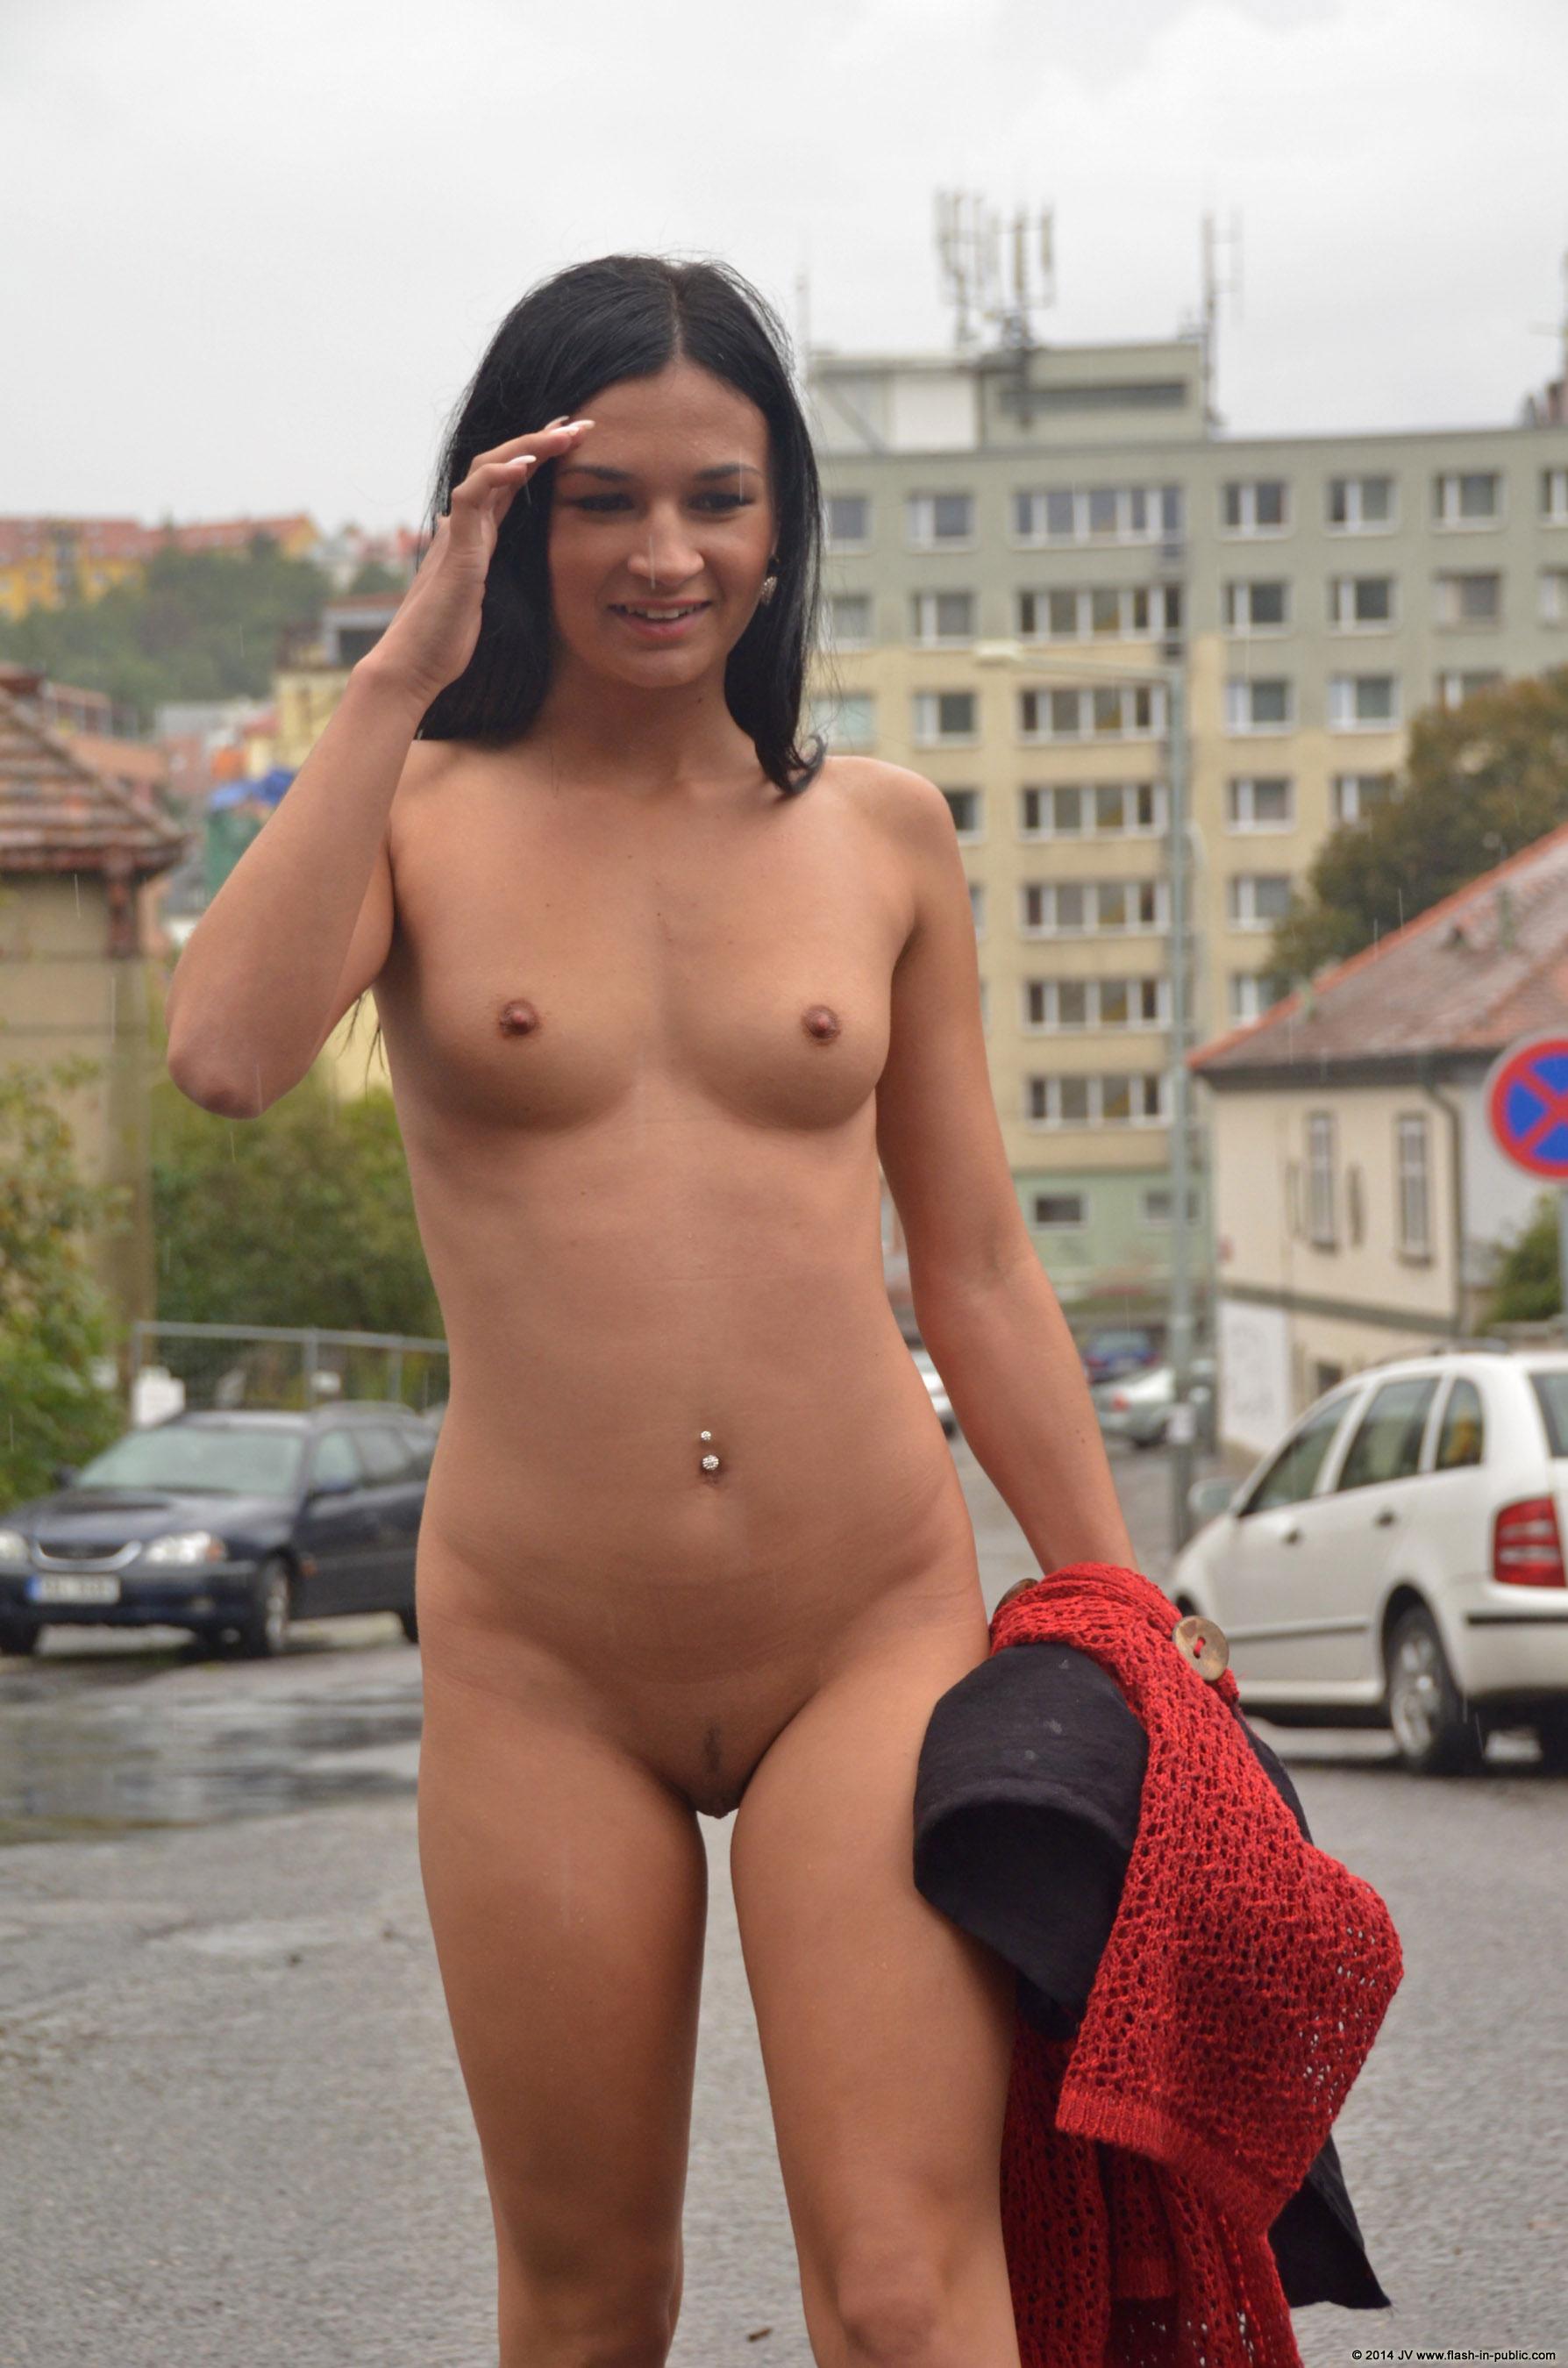 adela-brunette-nude-rain-wet-flash-in-public-24